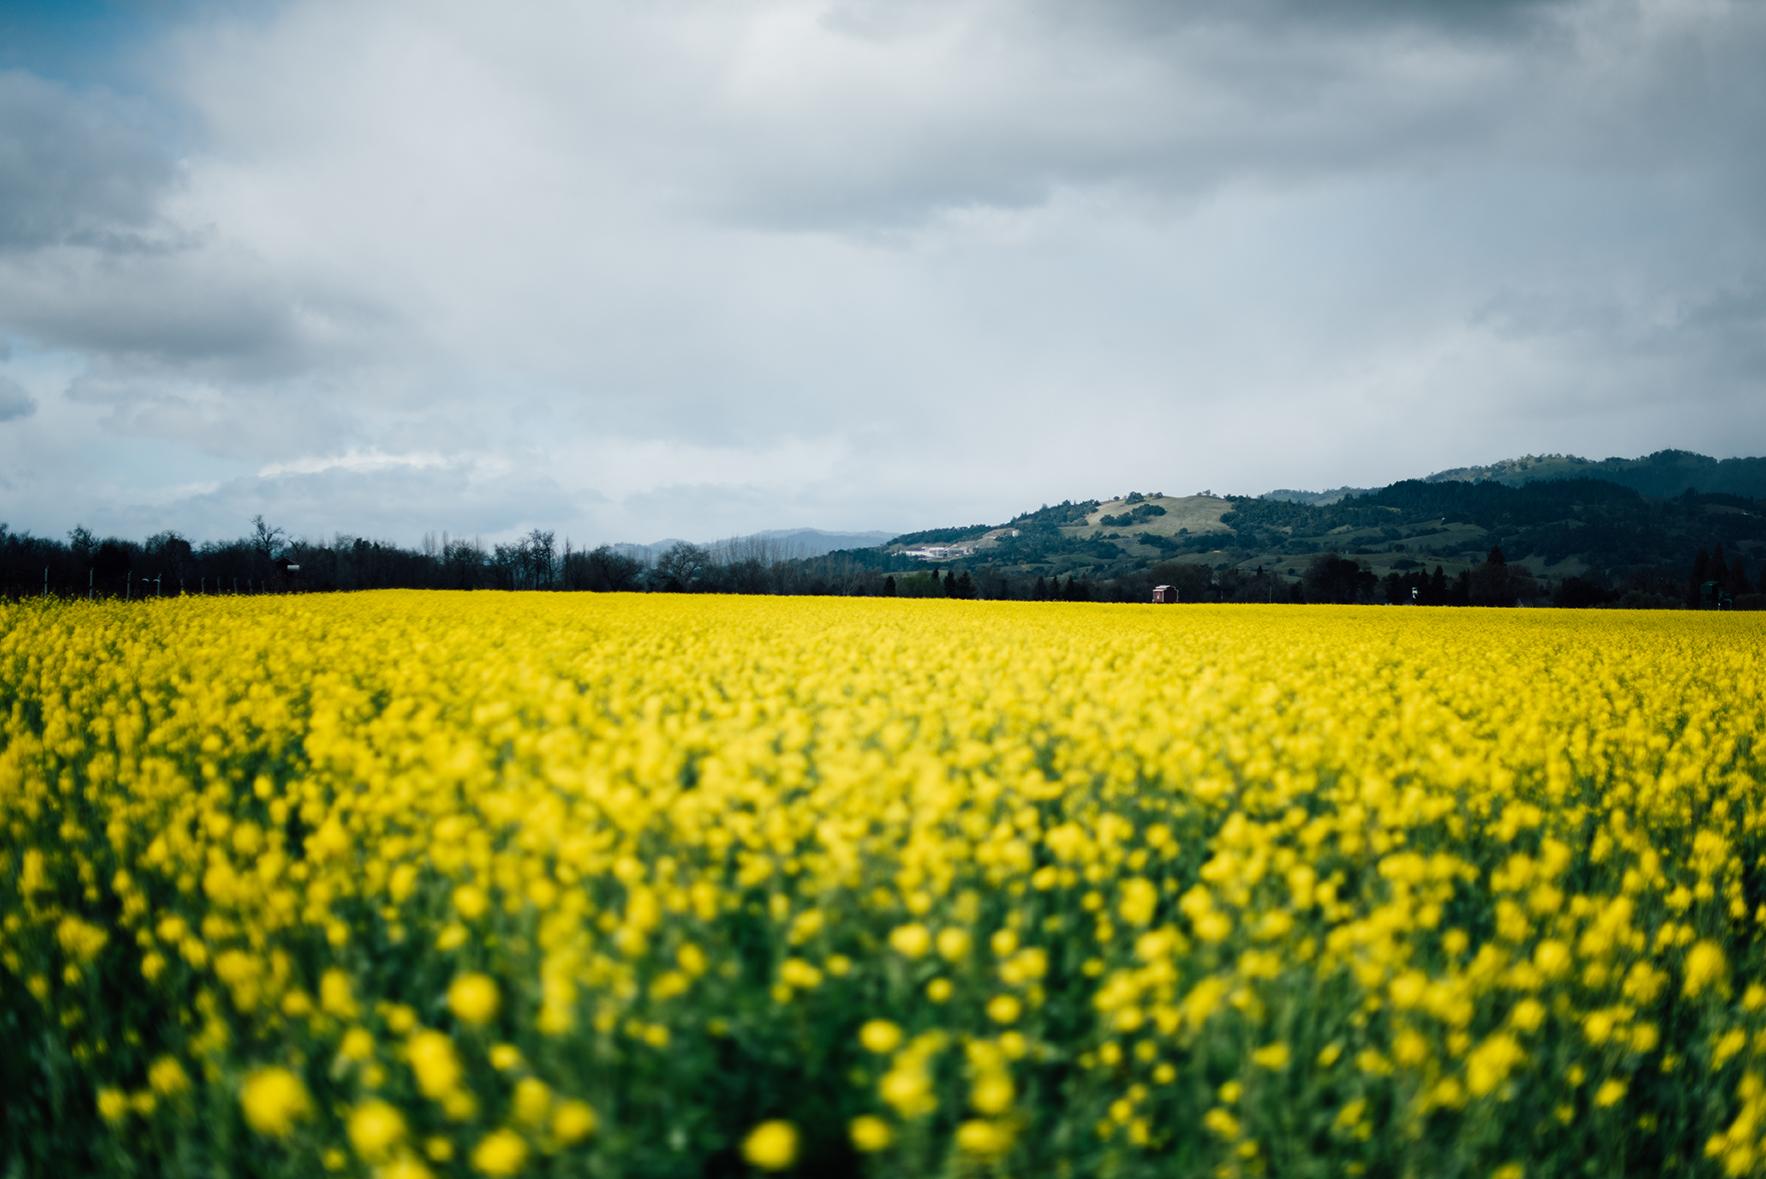 Sonoma, CA Wild Mustard Blooms | Nik Sharma